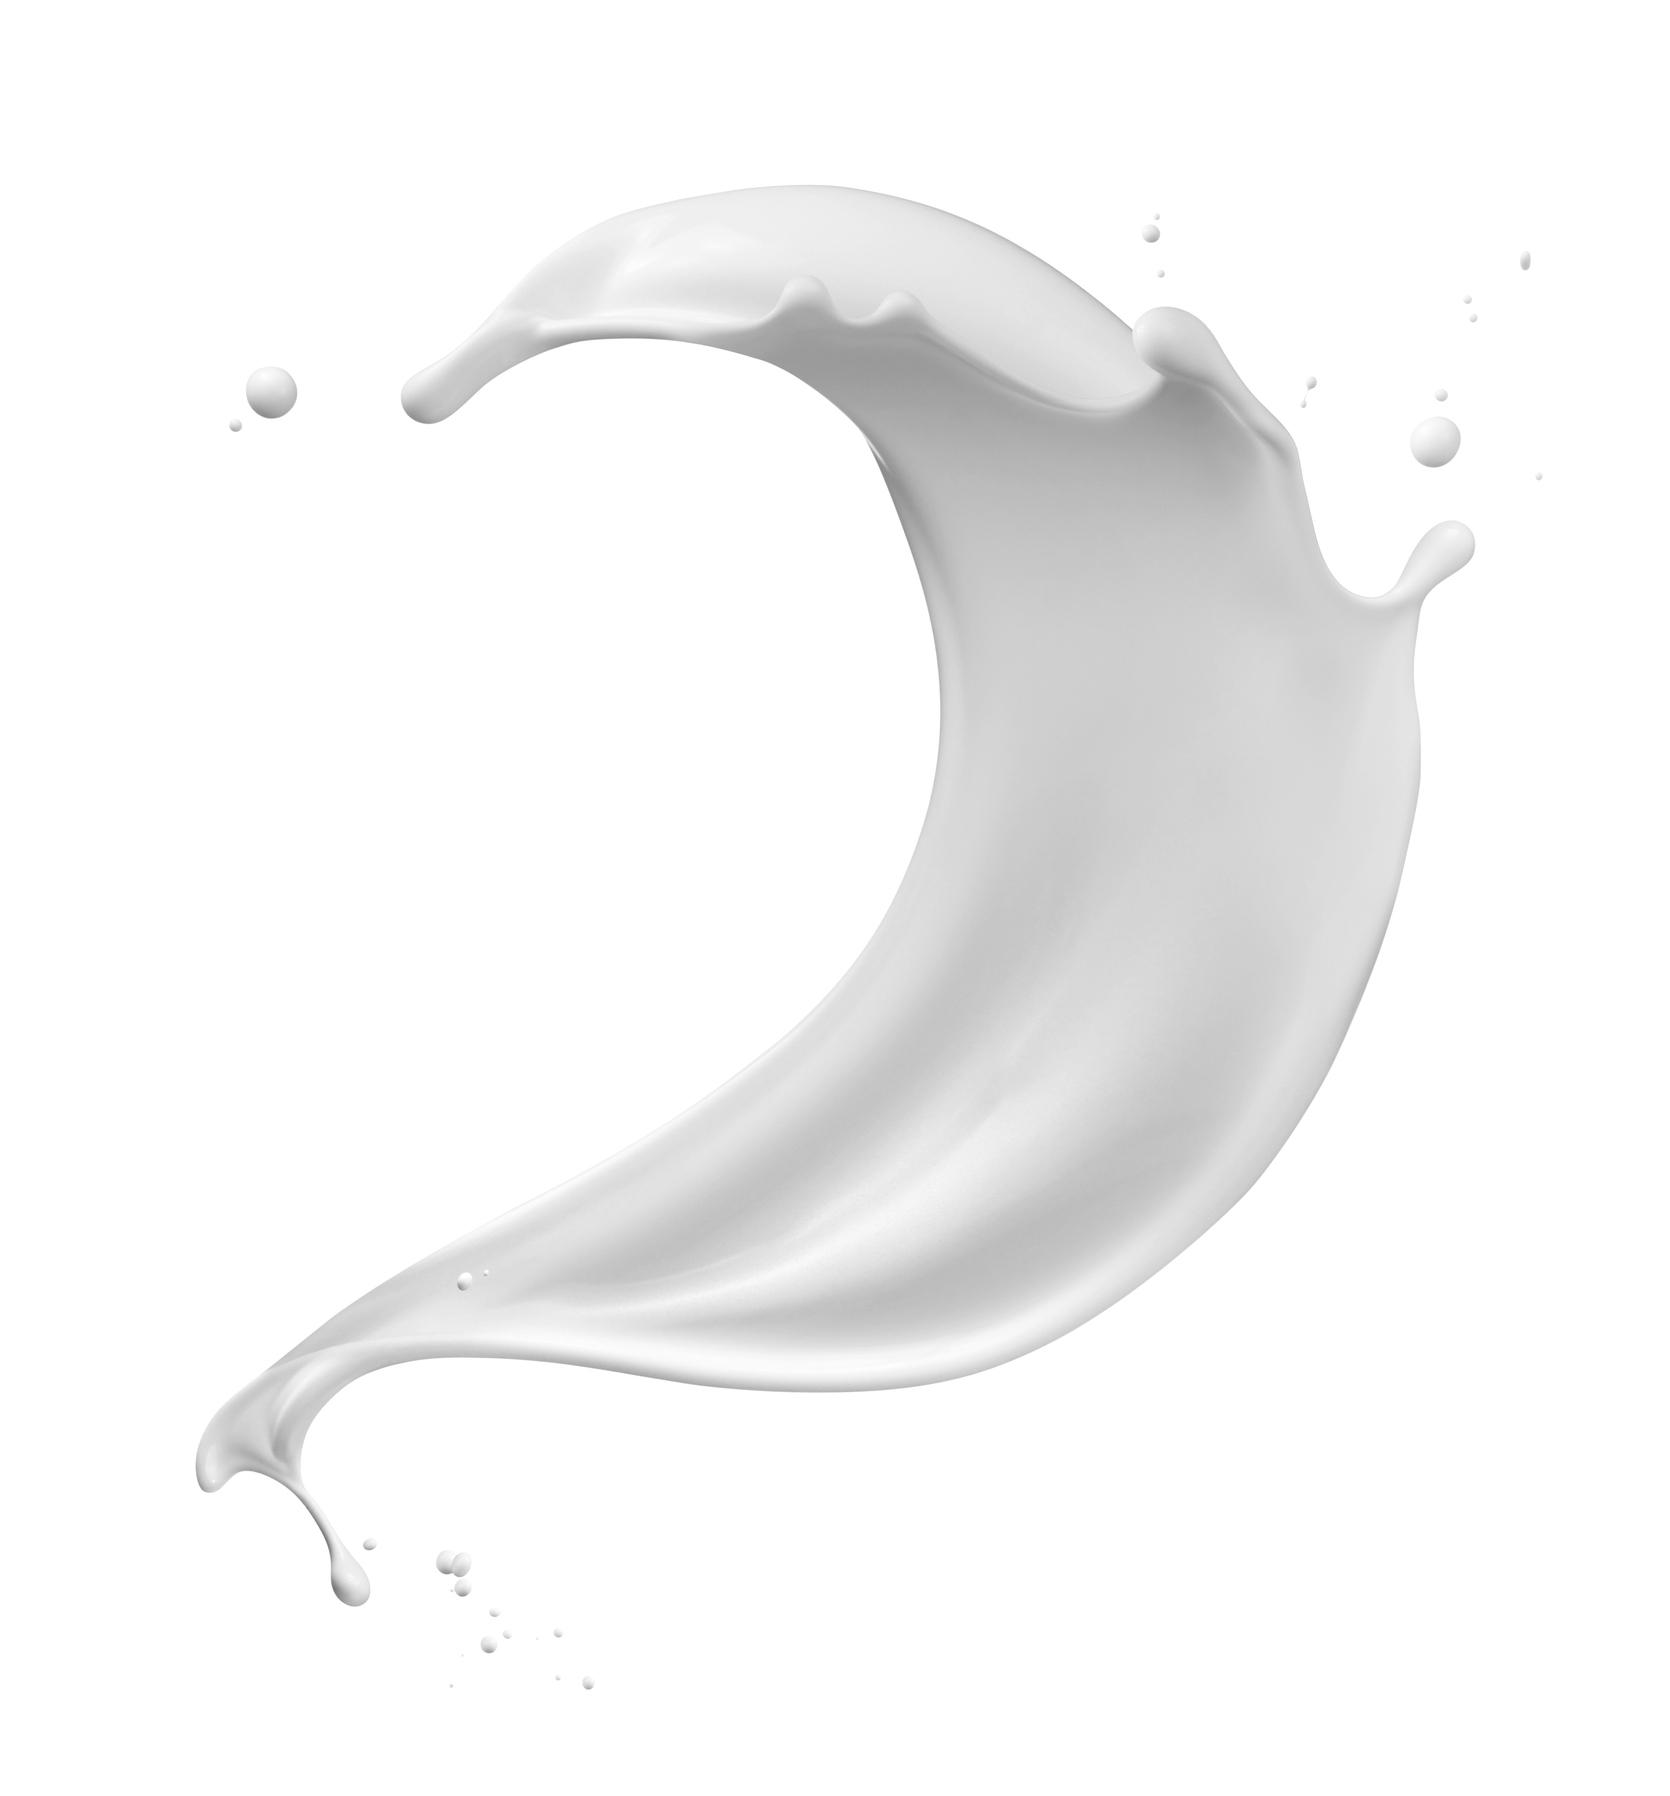 Milk - breasts